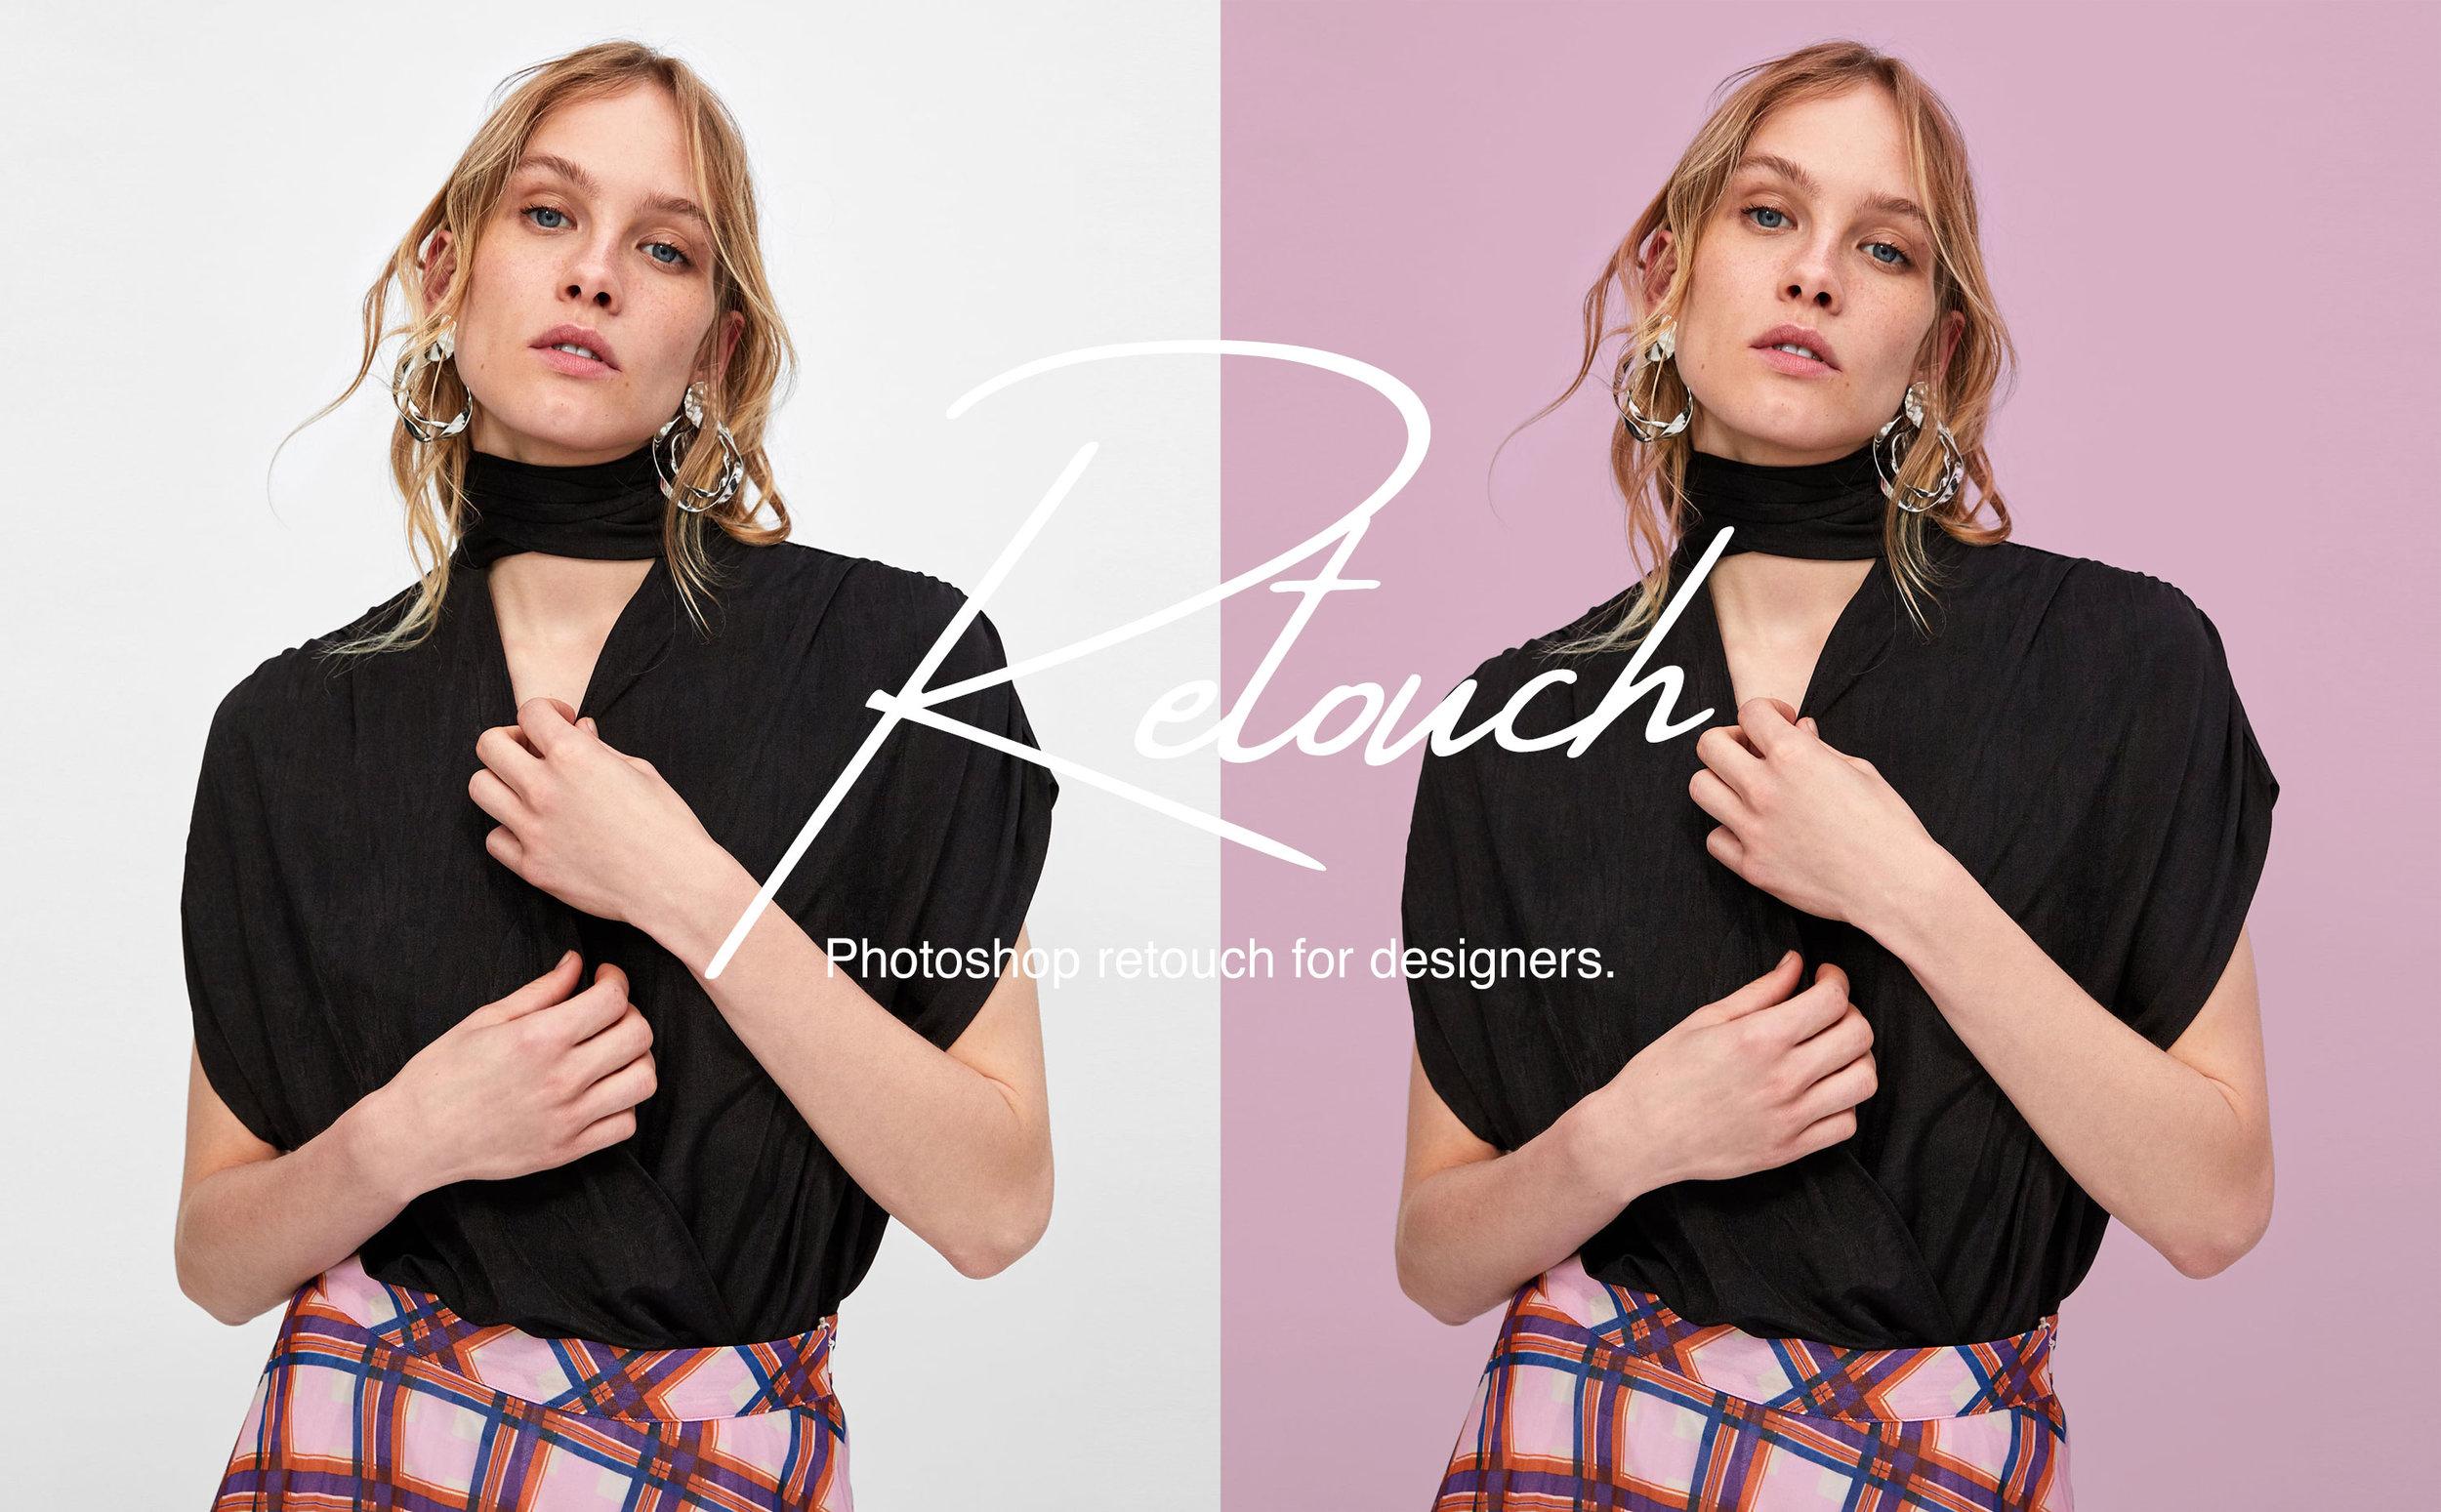 photoretouch1.jpg